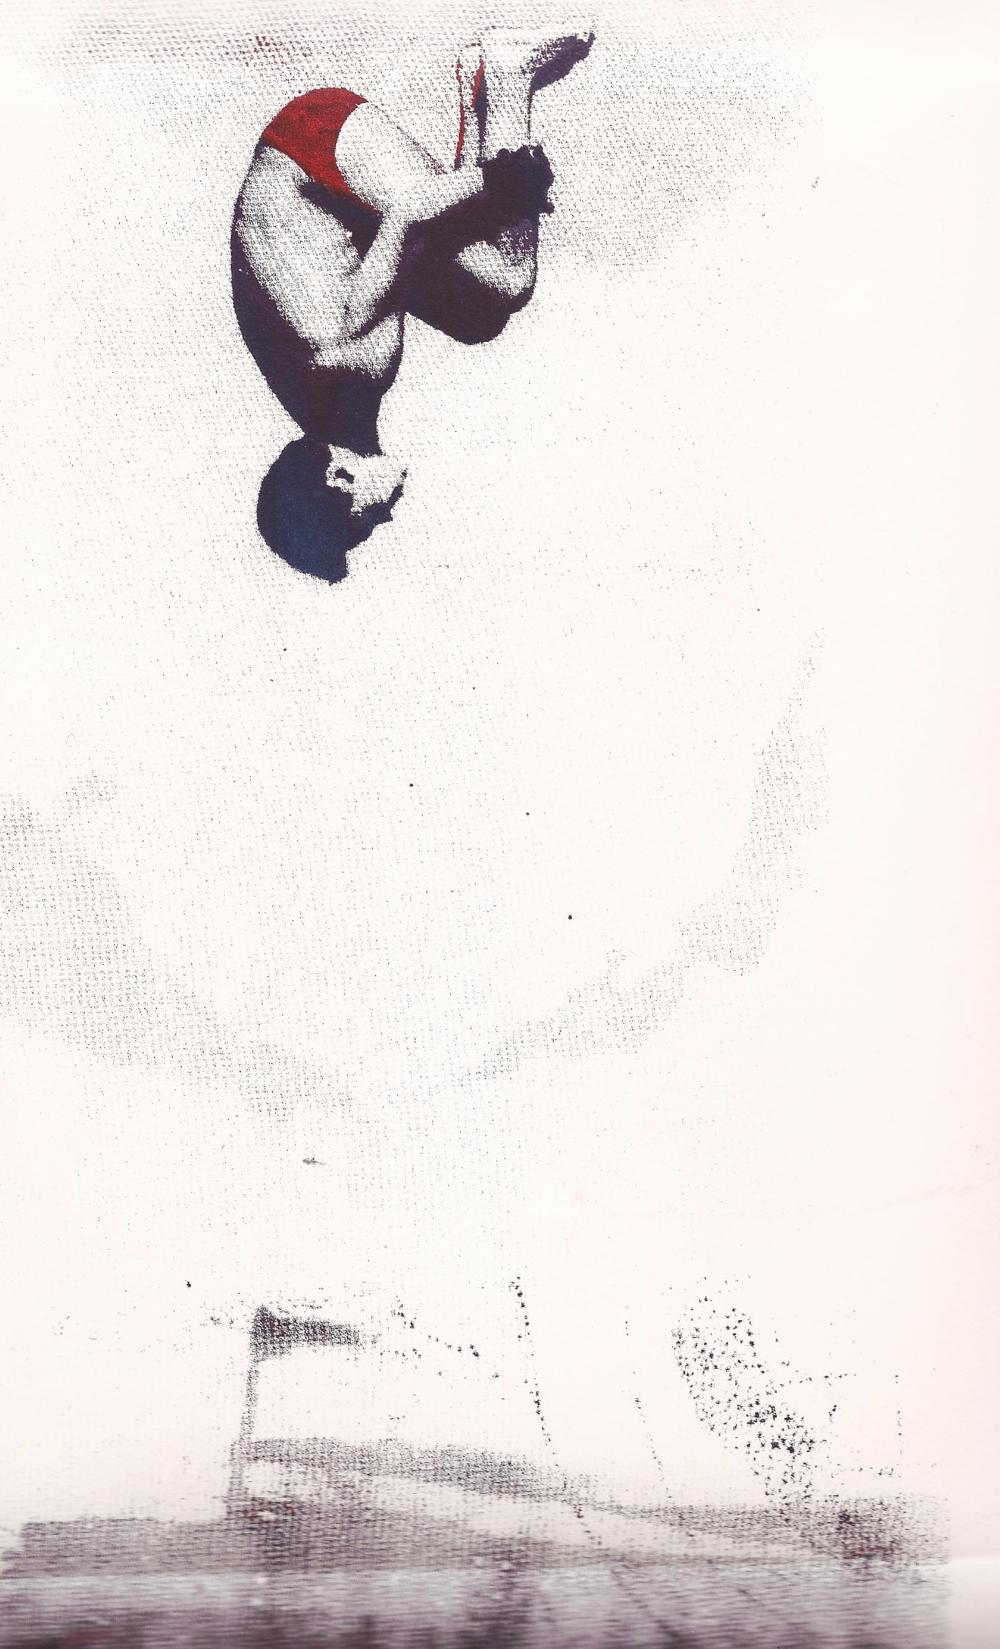 diverflyer.jpg